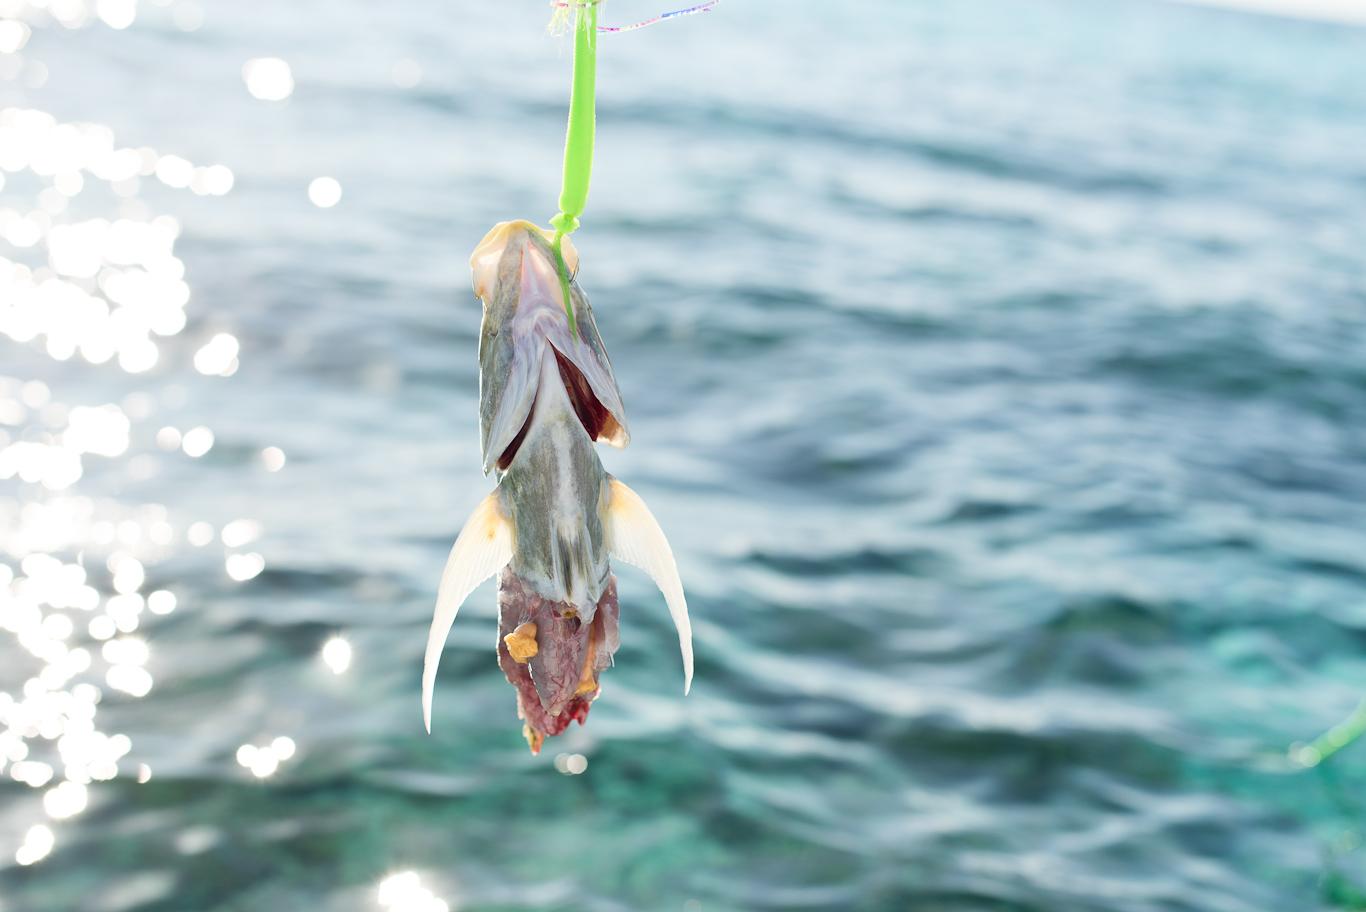 Jack, Flyfishing, Bahamas, Flyfishing, South Andros